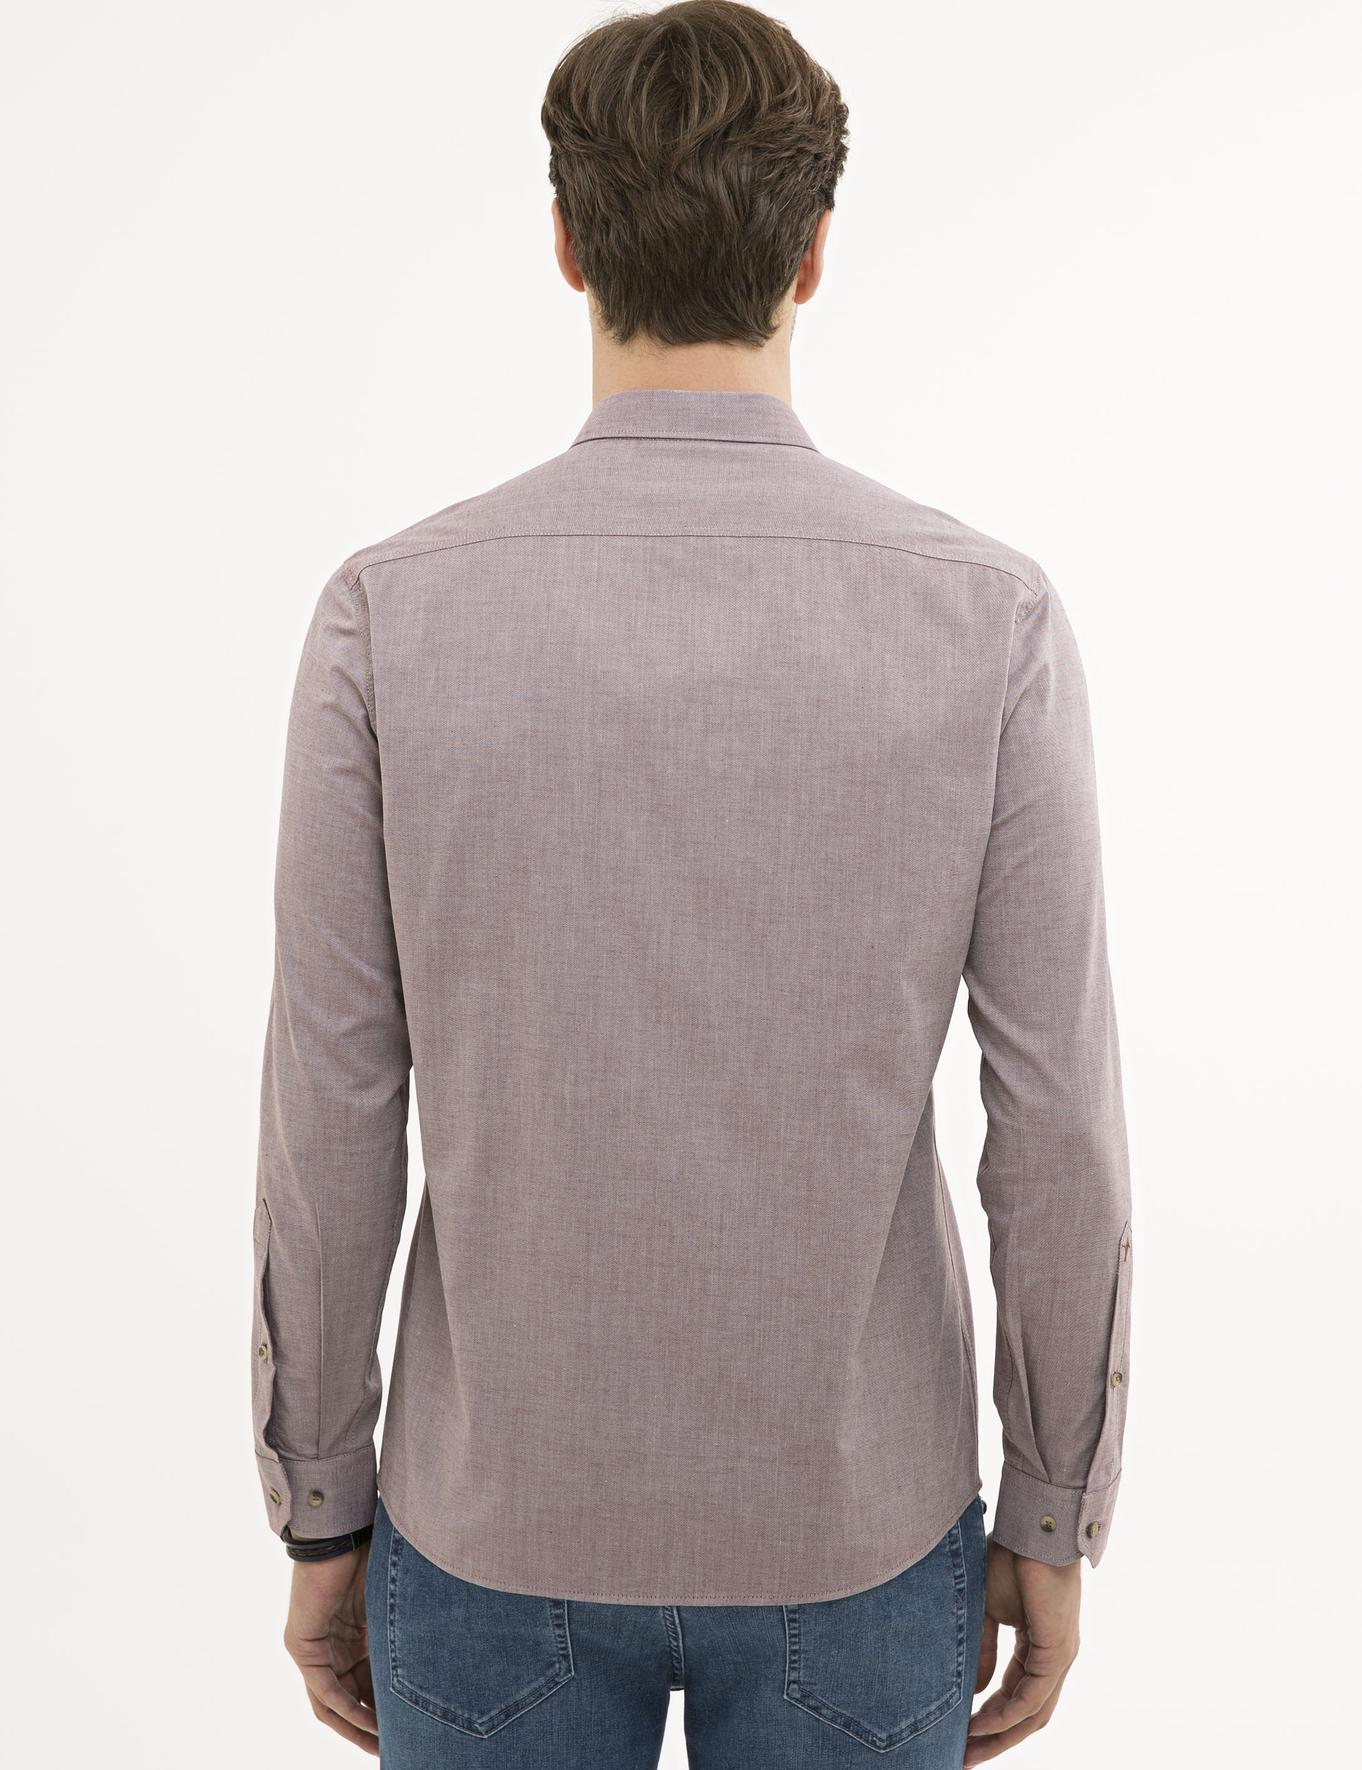 Kırmızı Slim Fit Gömlek - 50221293109